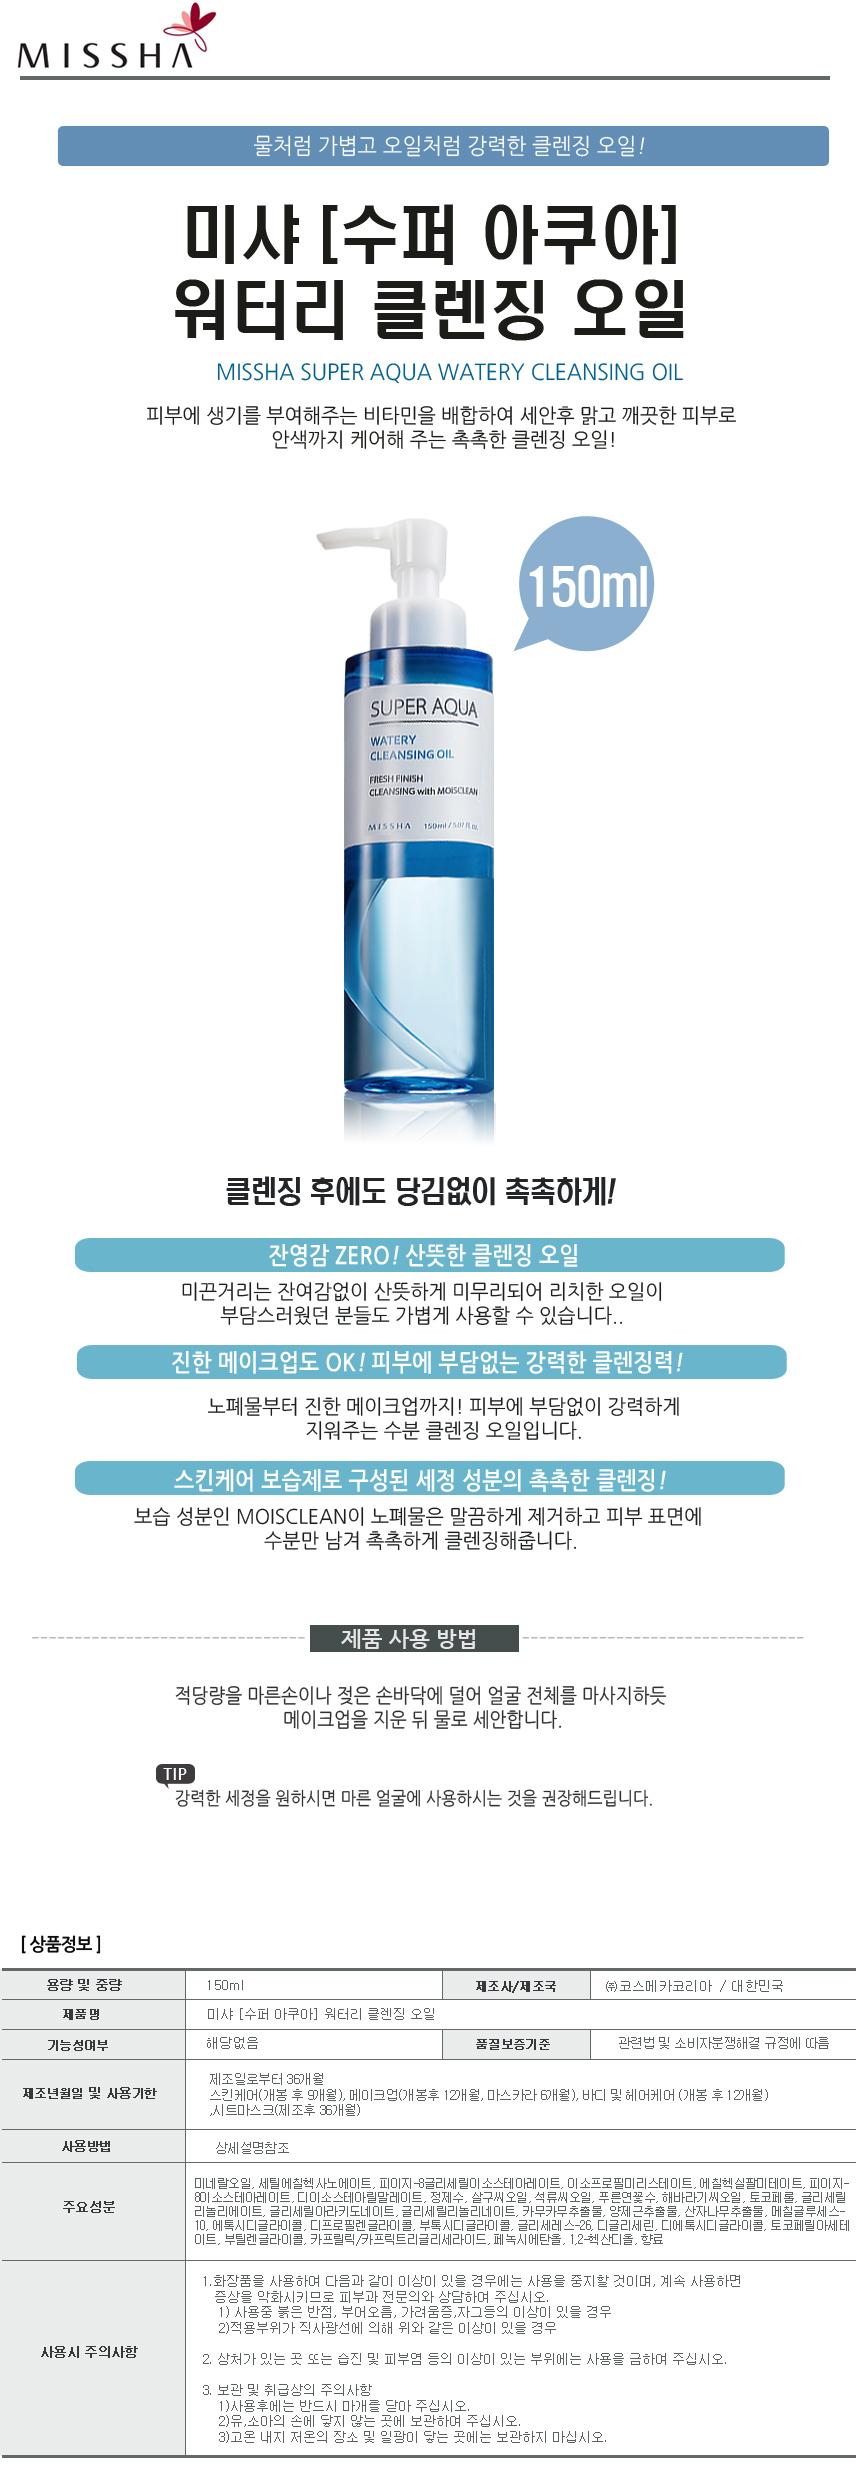 Dau-tay-trang-MISSHA-Super-Aqua-Watery-Cleansing-Oil-150ml